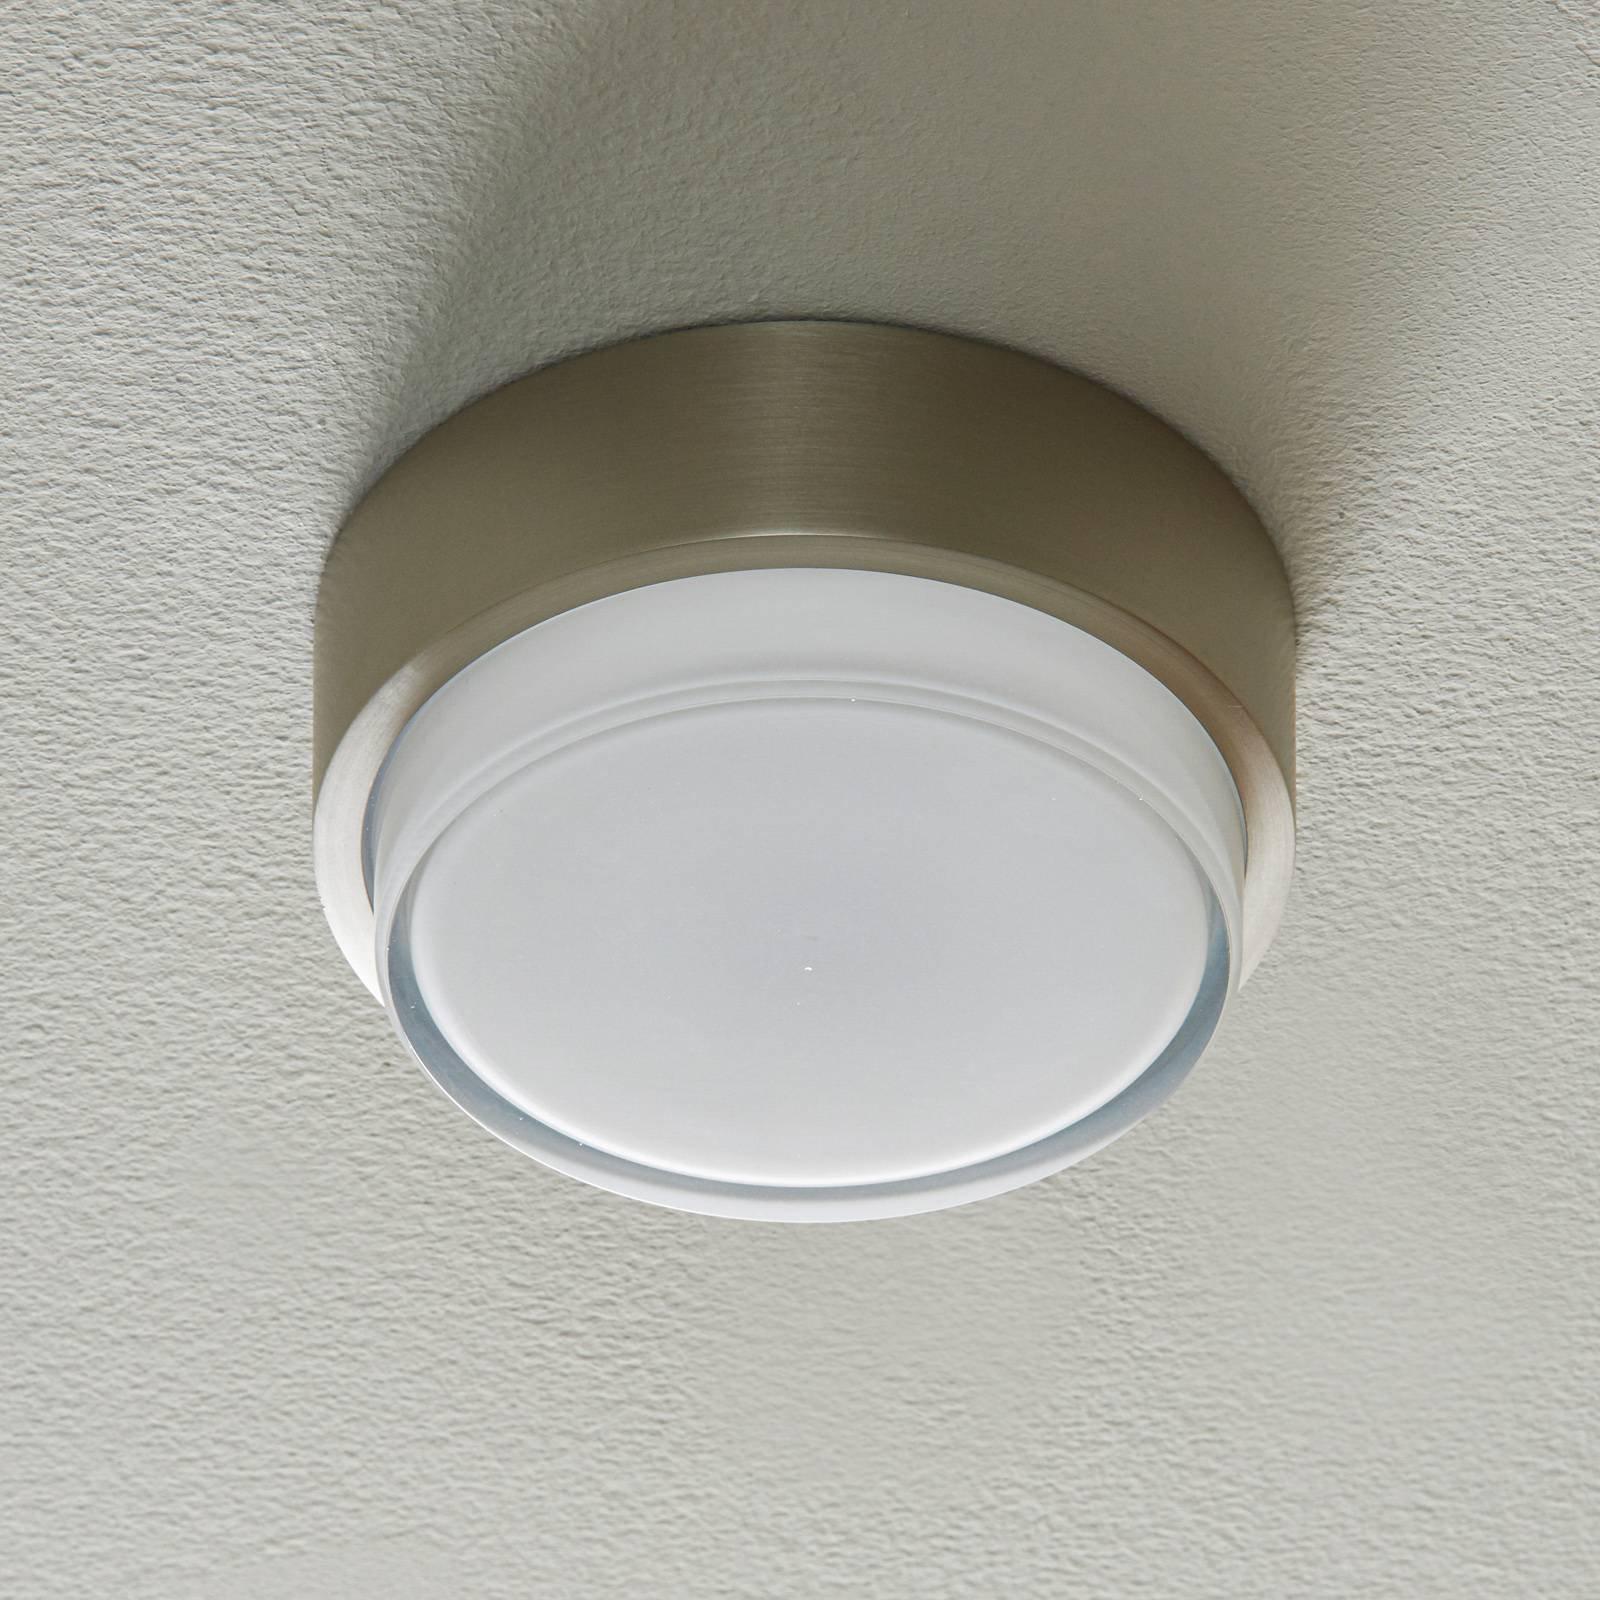 BEGA 50535 LED-taklampe 930 rustfritt stål Ø15,5cm